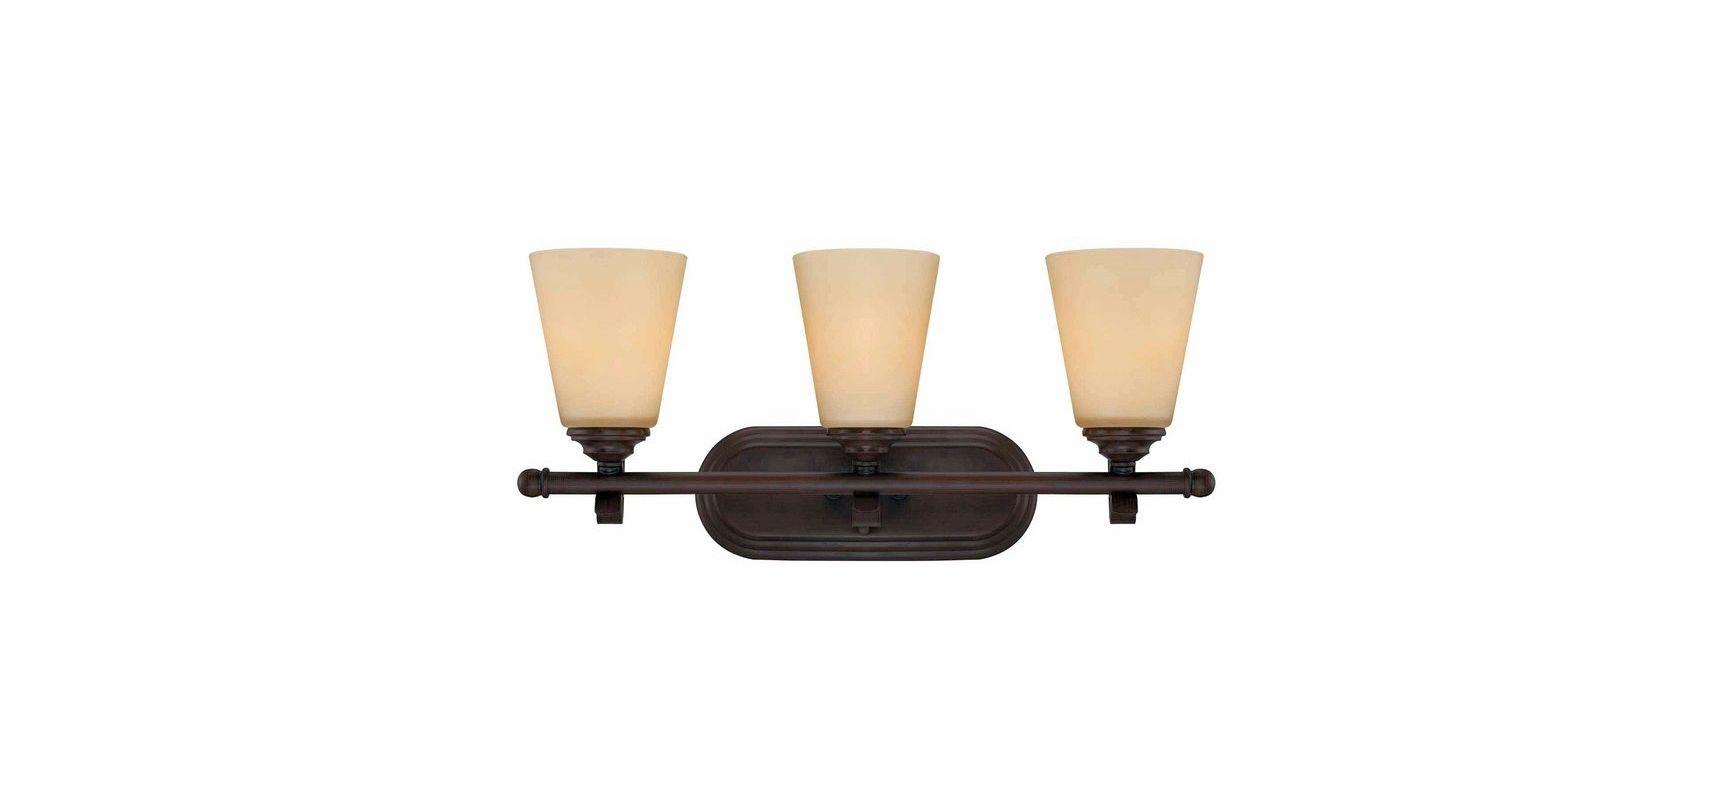 "Savoy House 8P-2177-3 Maremma 23"" Wide 3 Light Bathroom Vanity Light"